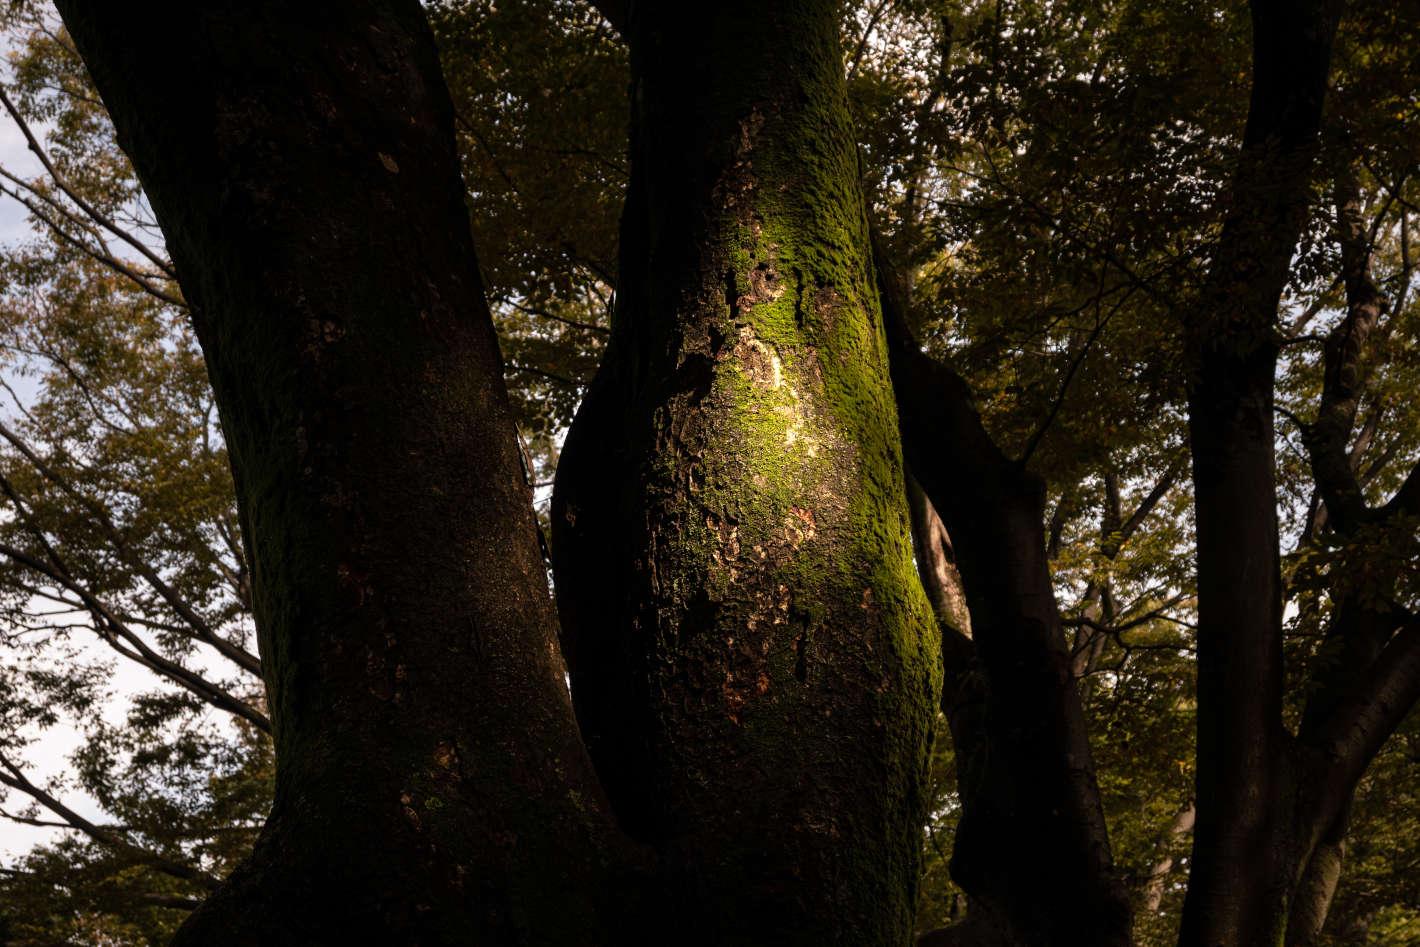 Z 50、NIKKOR Z DX 16-50mm f/3.5-6.3 VR/photo by Ken Tanahashi